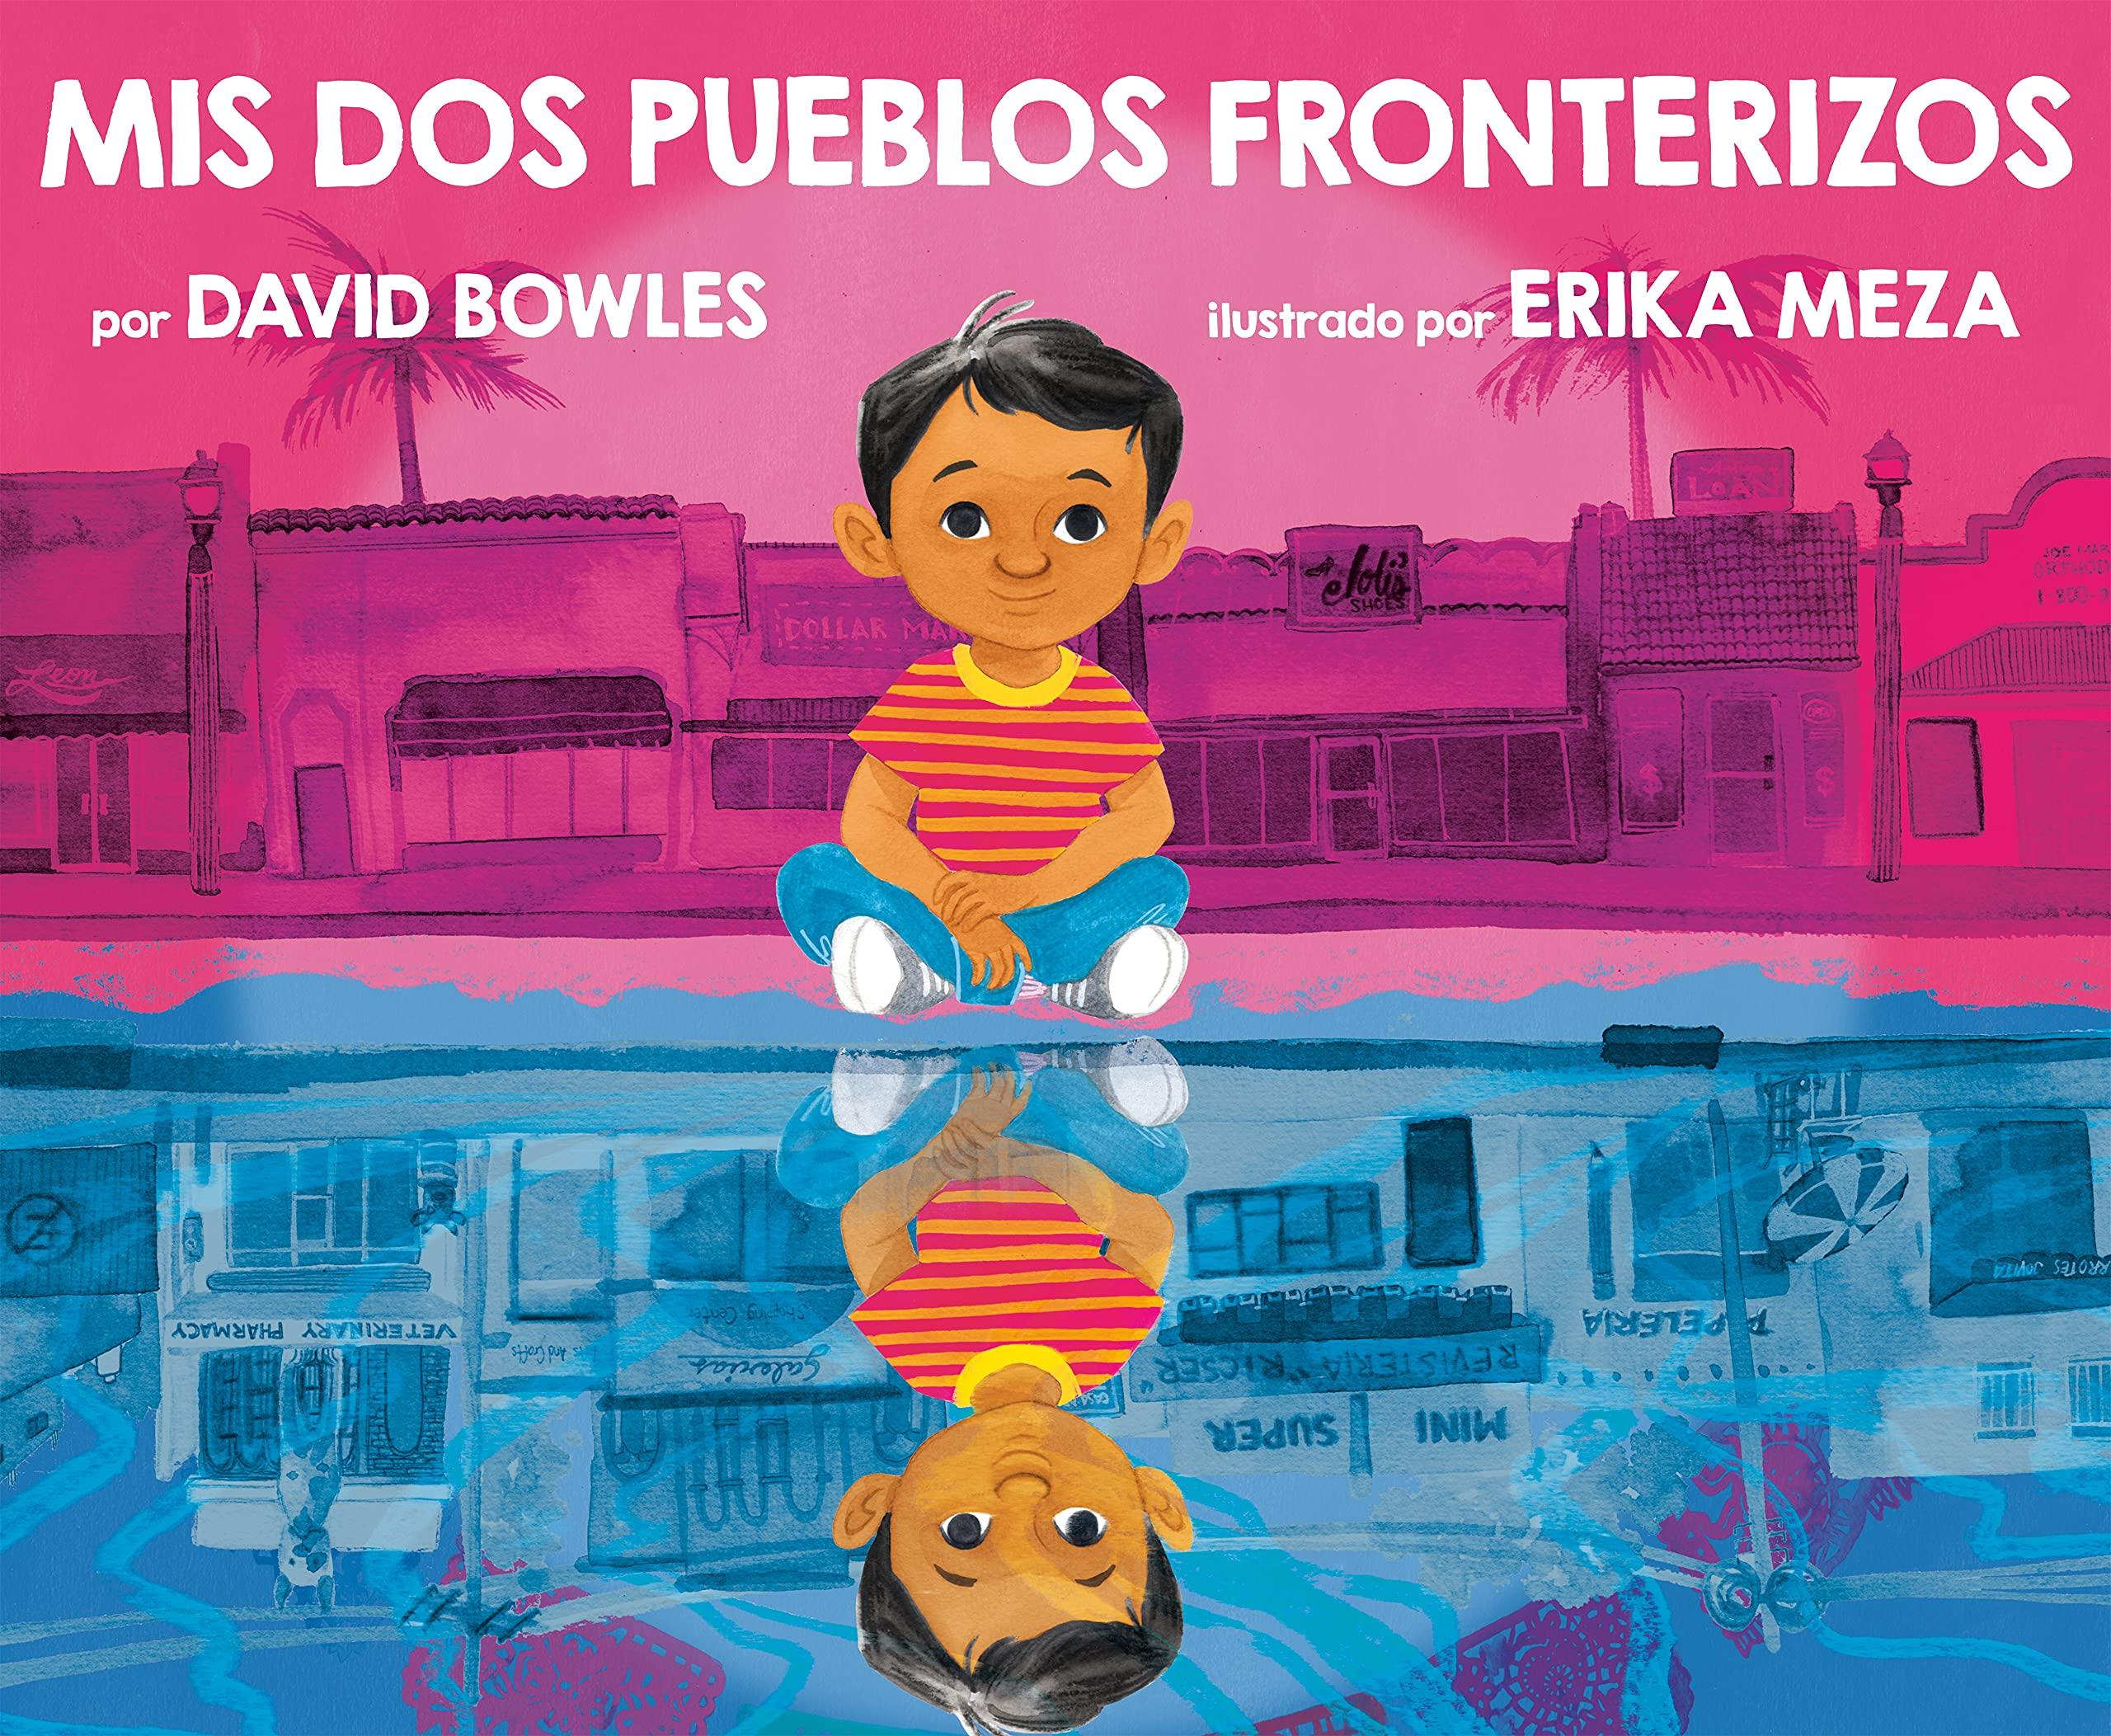 Mis dos pueblos fronterizos (Spanish Edition): Bowles, David, Meza, Erika:  9780593325070: Amazon.com: Books